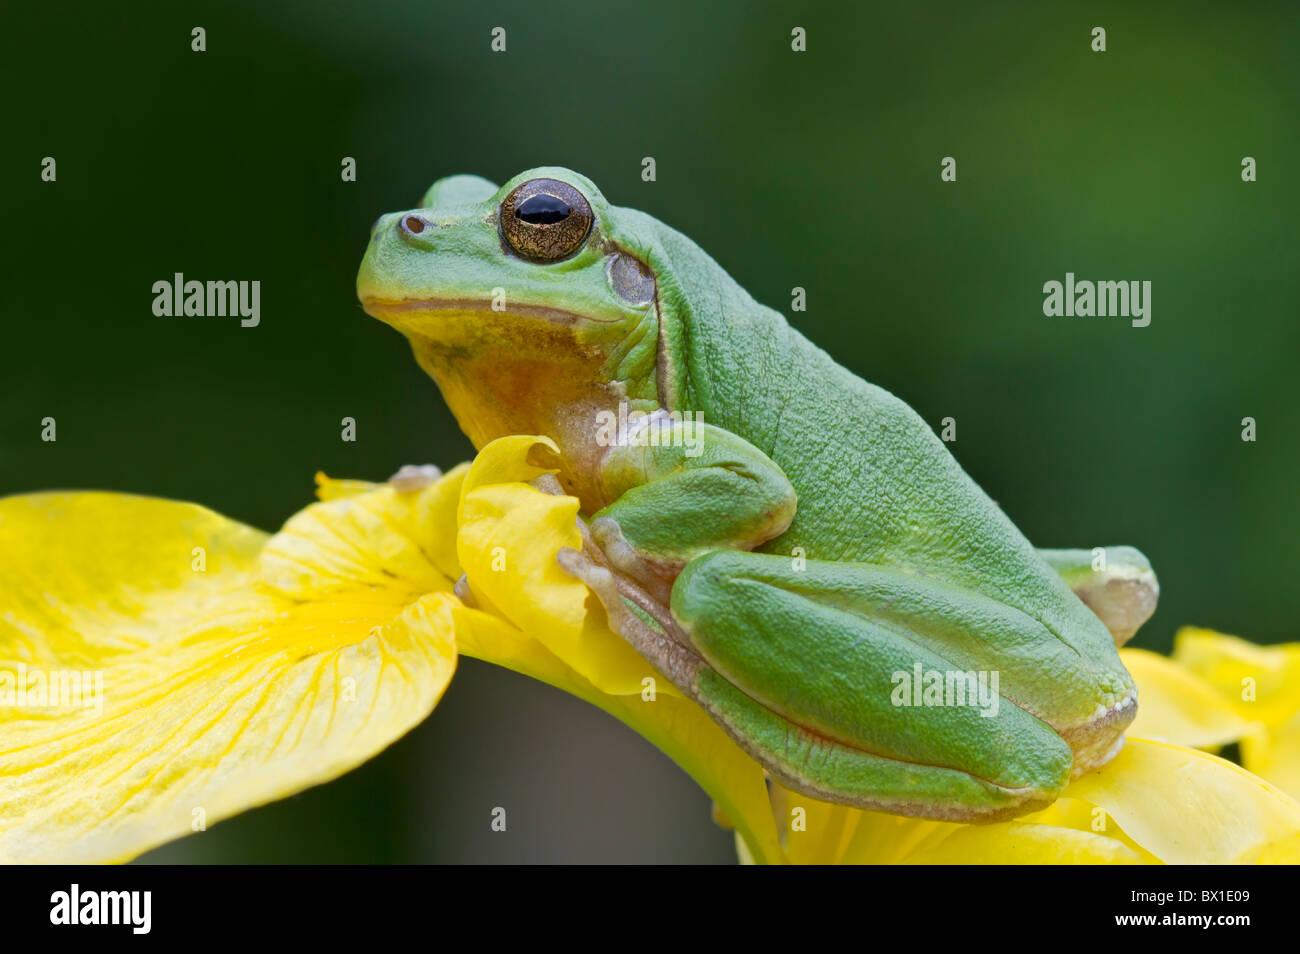 Tree frog sitting on a yellow iris - Hyla arborea - Stock Image